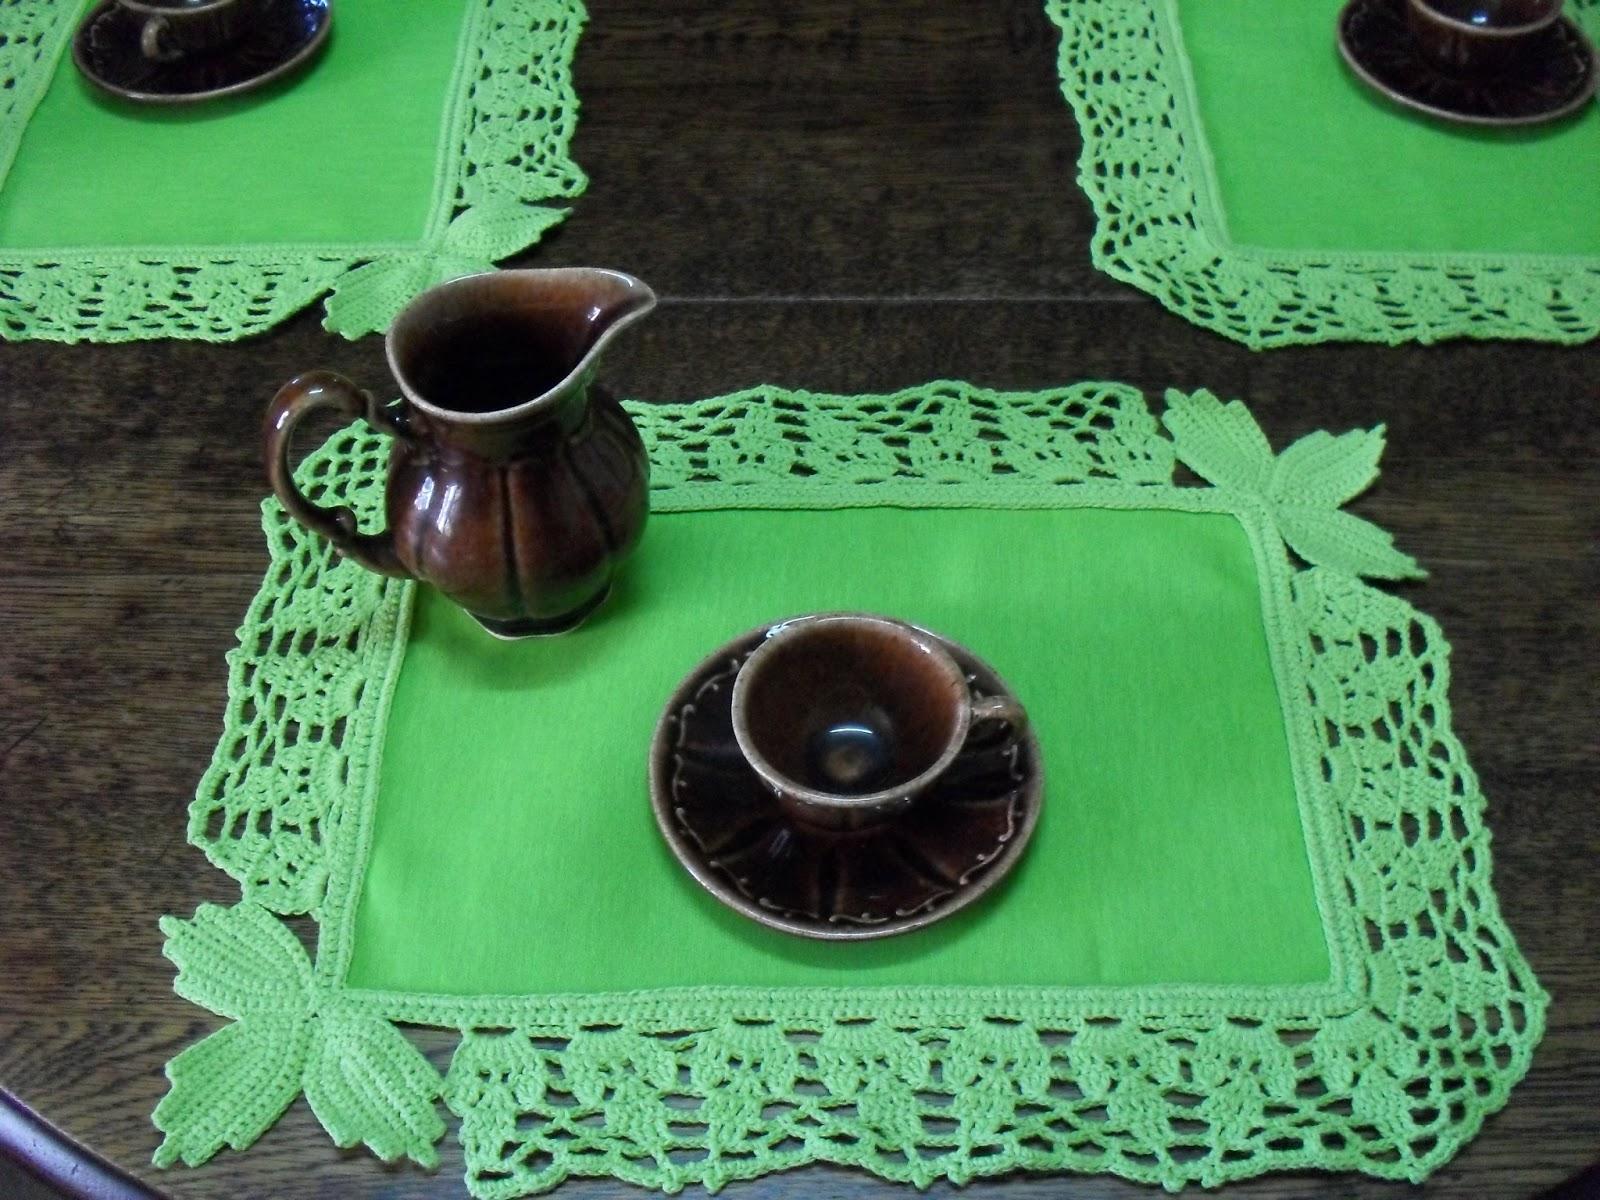 Vivicrochet visillos caminos de mesa carpetas manteles accesorios para decoracion - Individuales para mesa ...